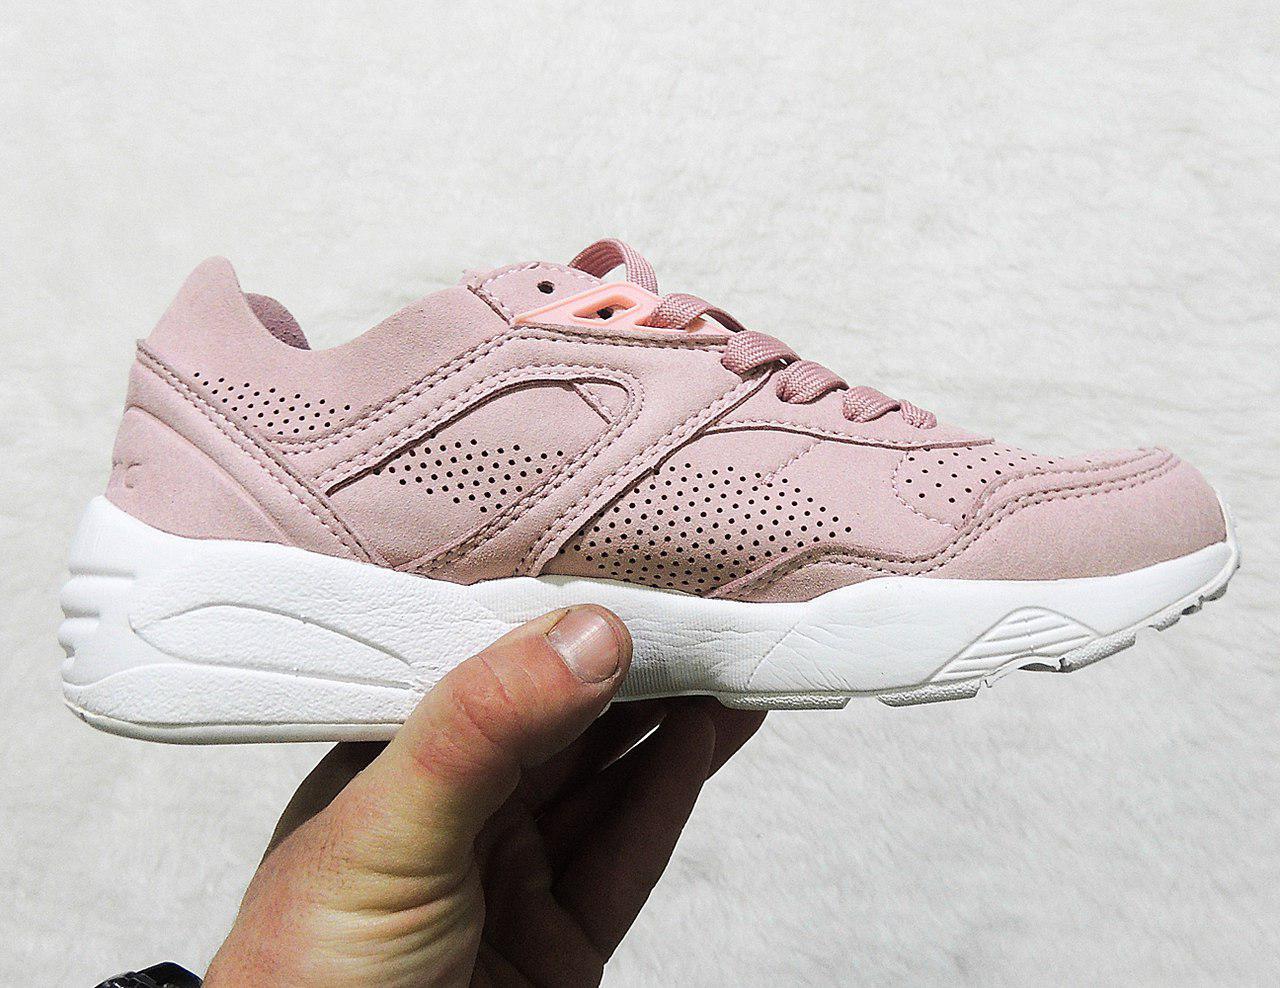 52fd38c2a670 Женские кроссовки Puma Trinomic R698 Soft Pack Pink топ реплика -  Интернет-магазин обуви и